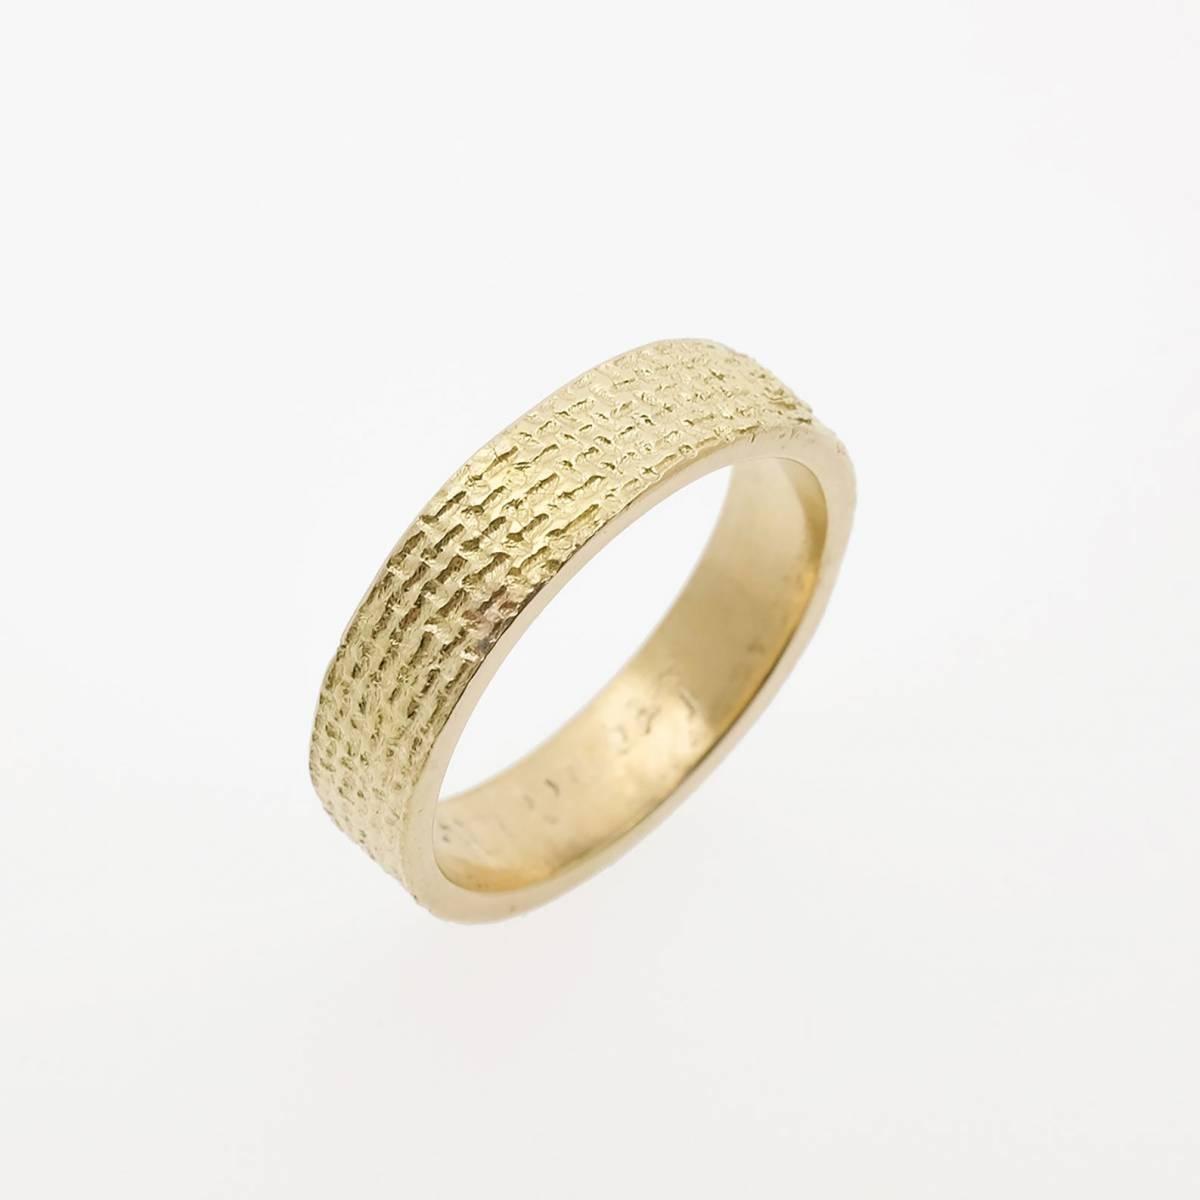 Jonas Maes Jewels - Juwelen - Bruidsjuwelen - Verlovingsring - Trouwring - House of Weddings - 6